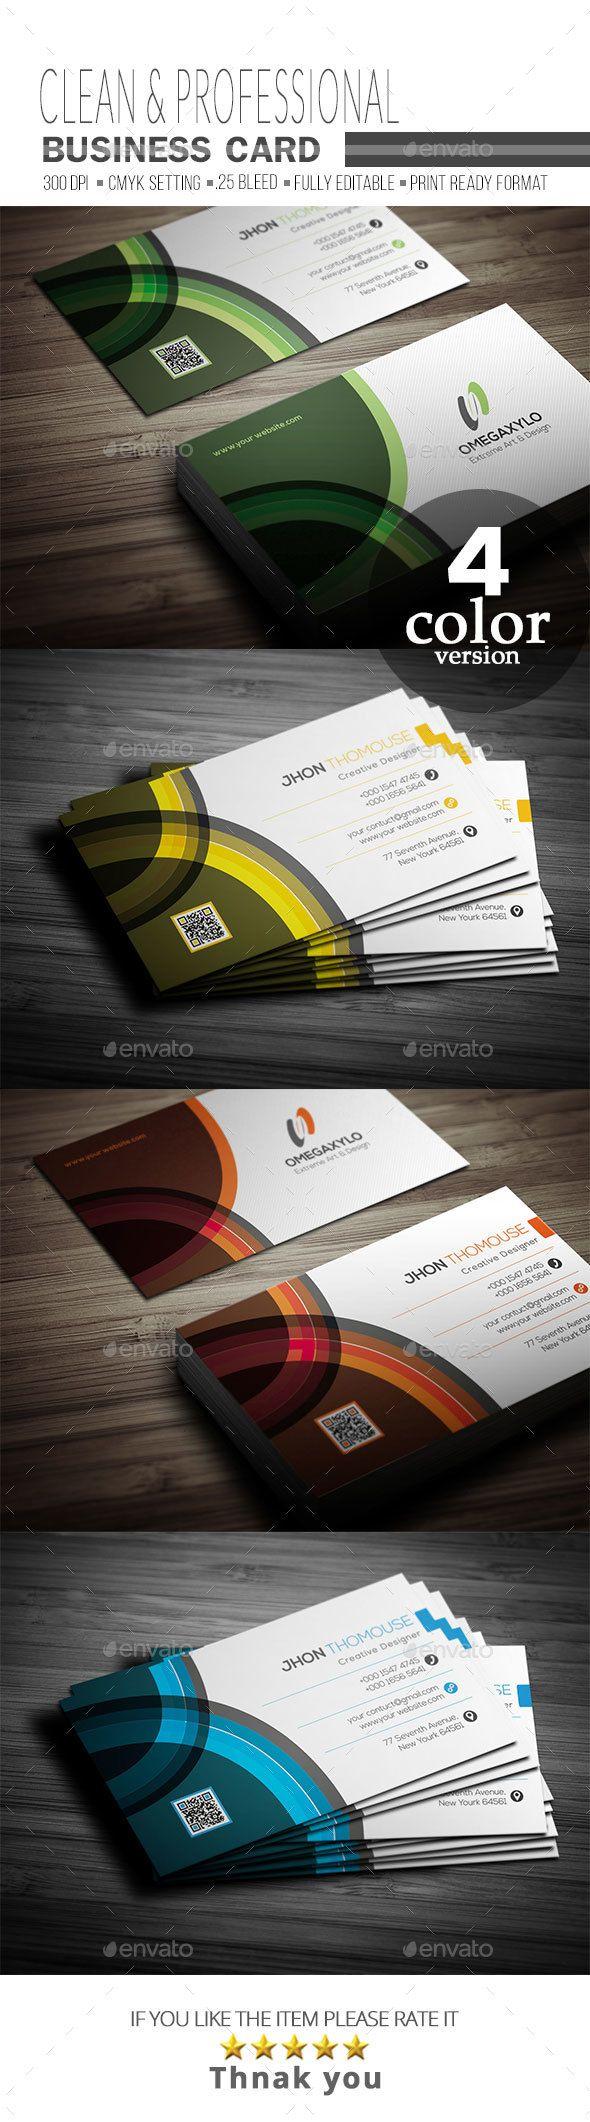 business card inspector | -business-card-design-executive-home ...